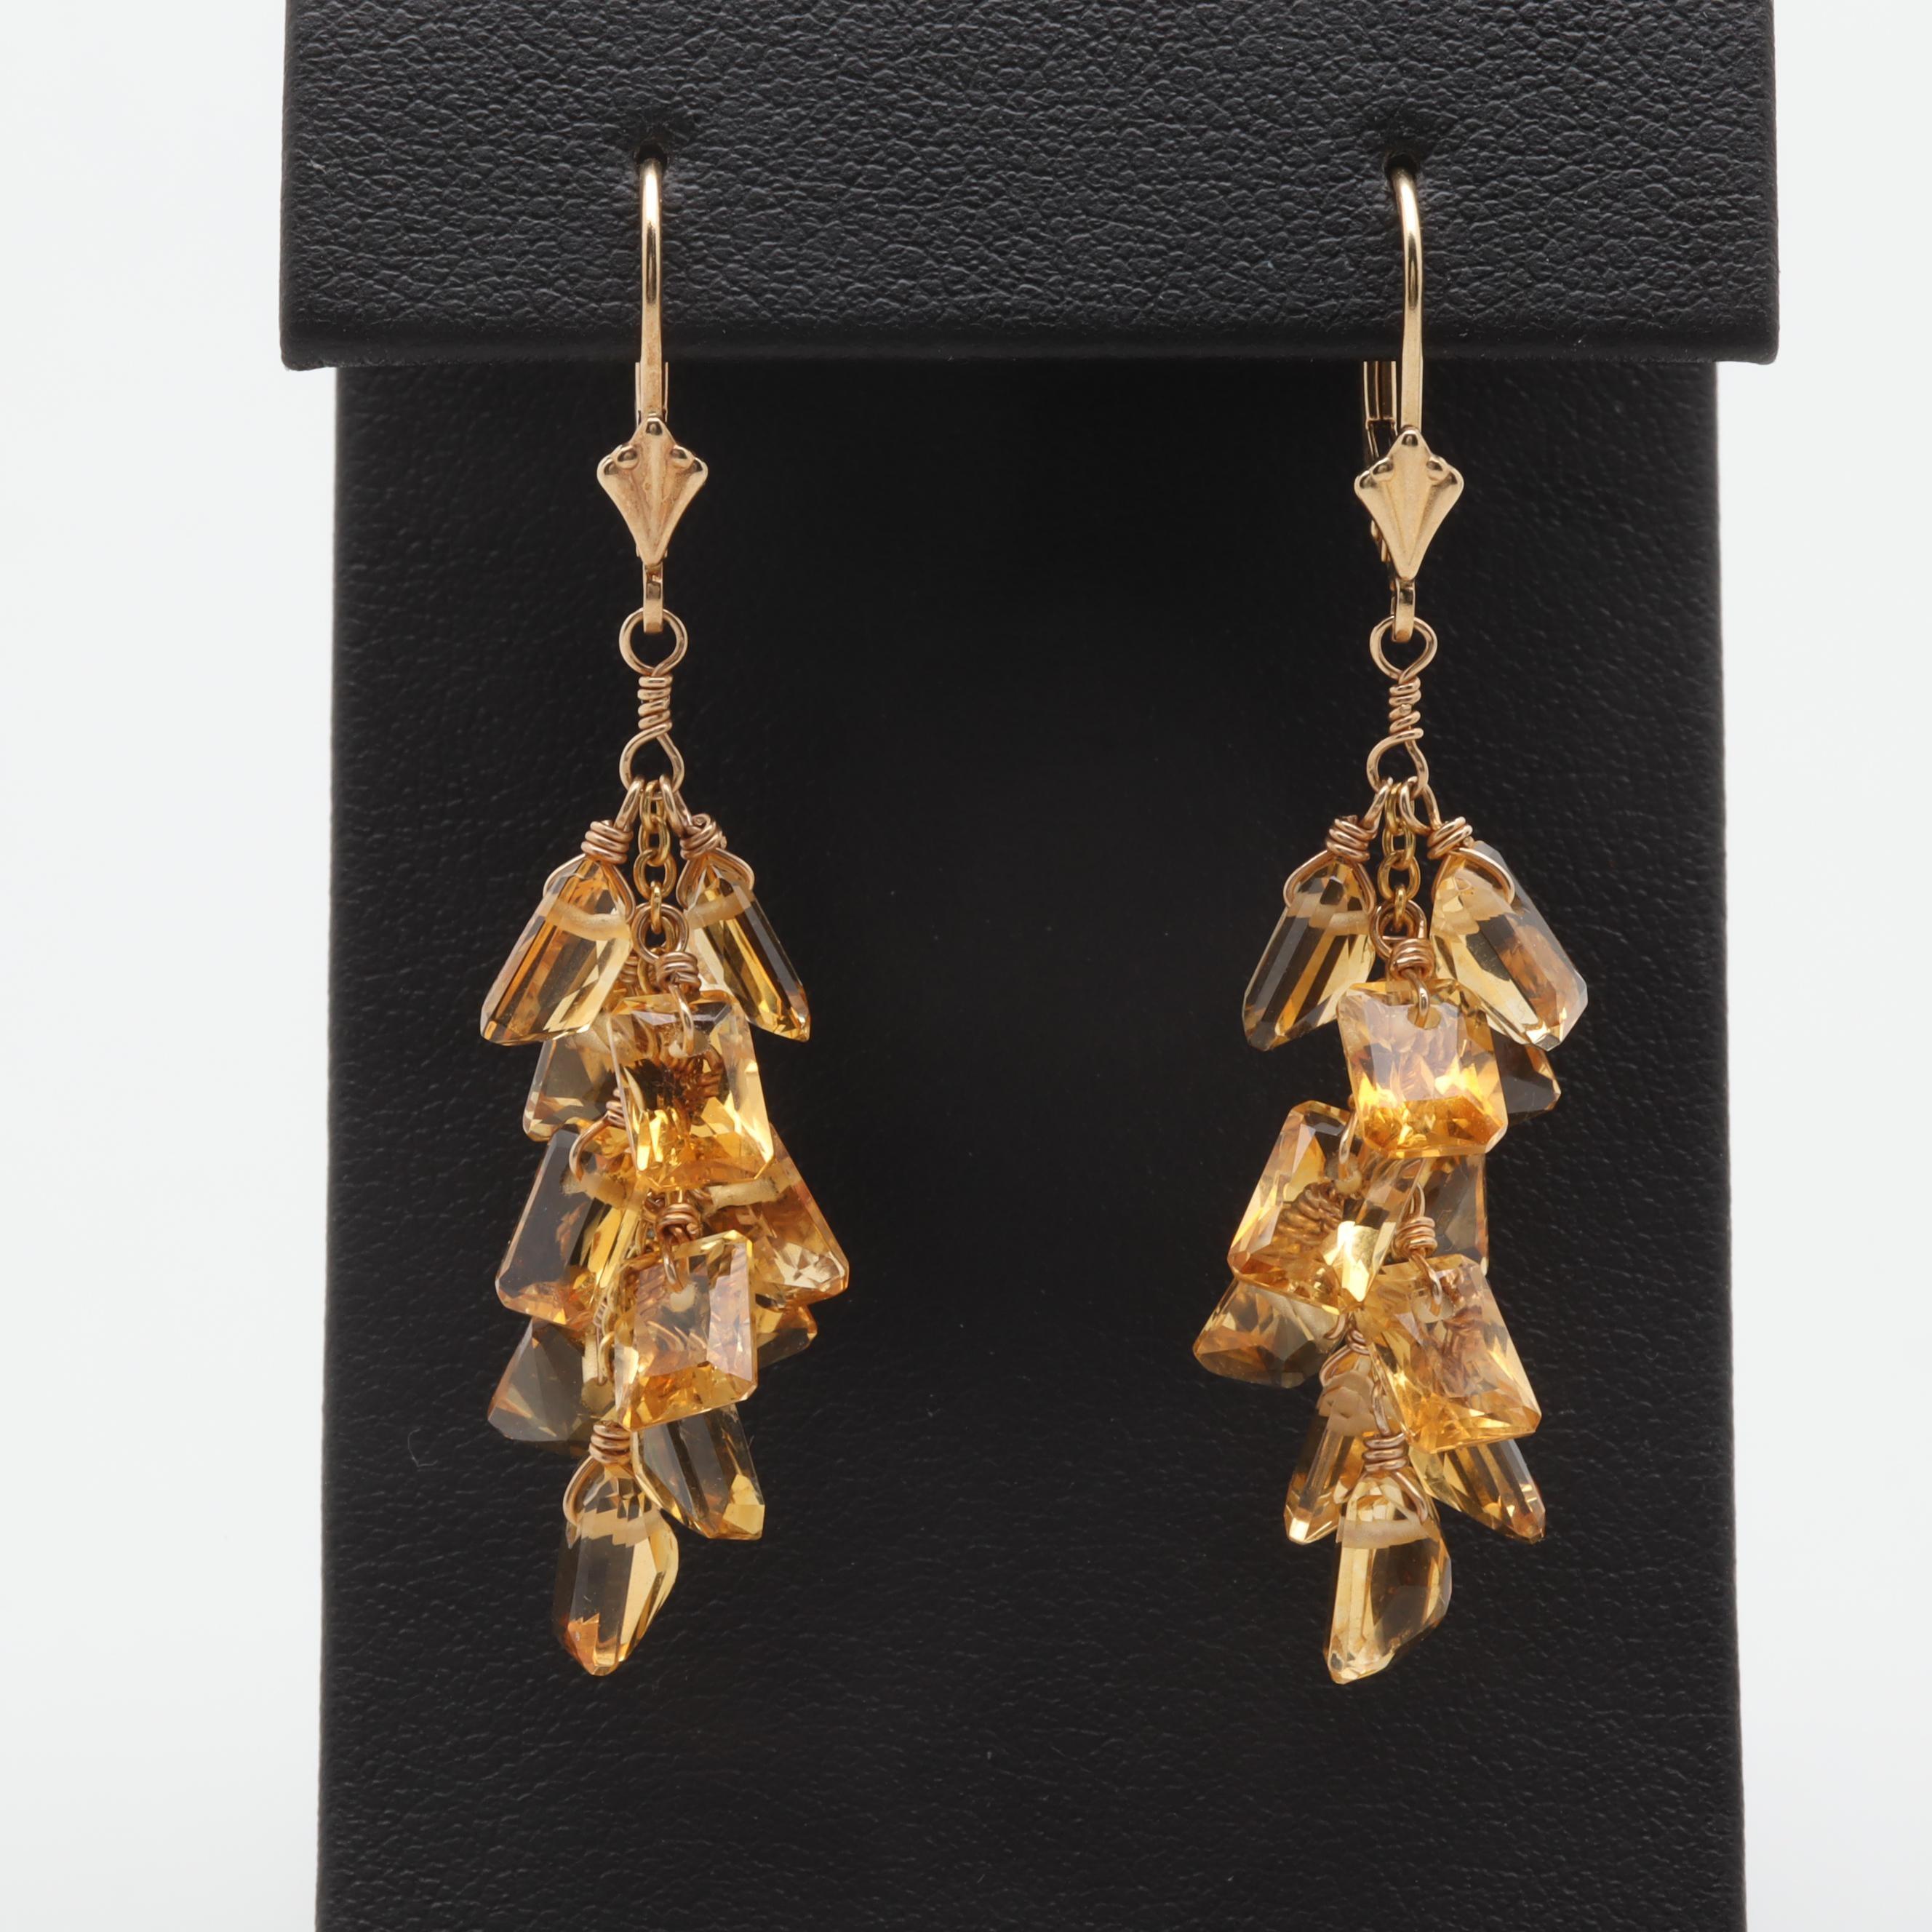 14K Yellow Gold Citrine Dangle Earrings